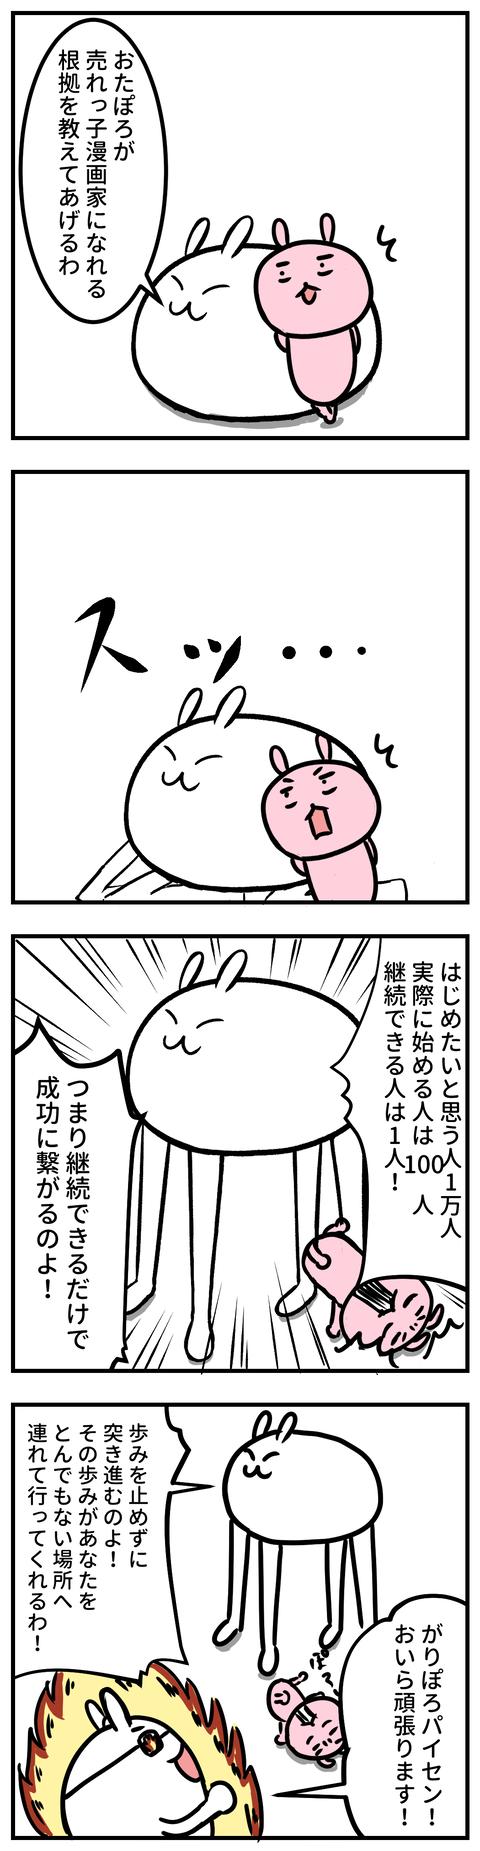 manga-yuzuporo42-2